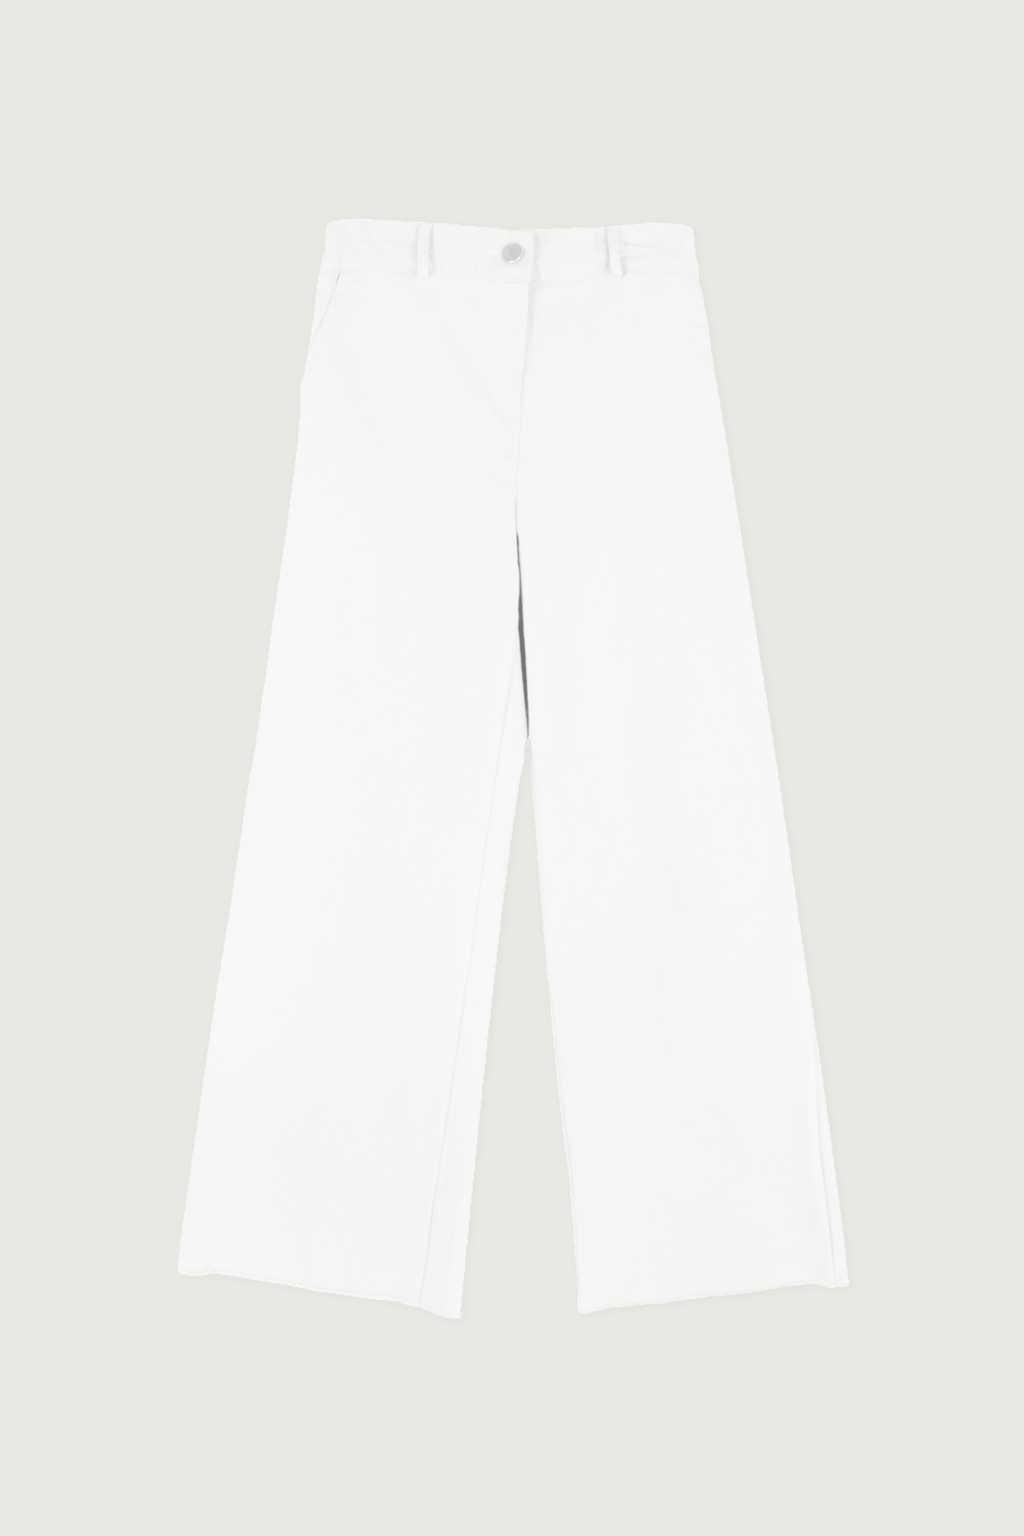 Pant K001 White 4